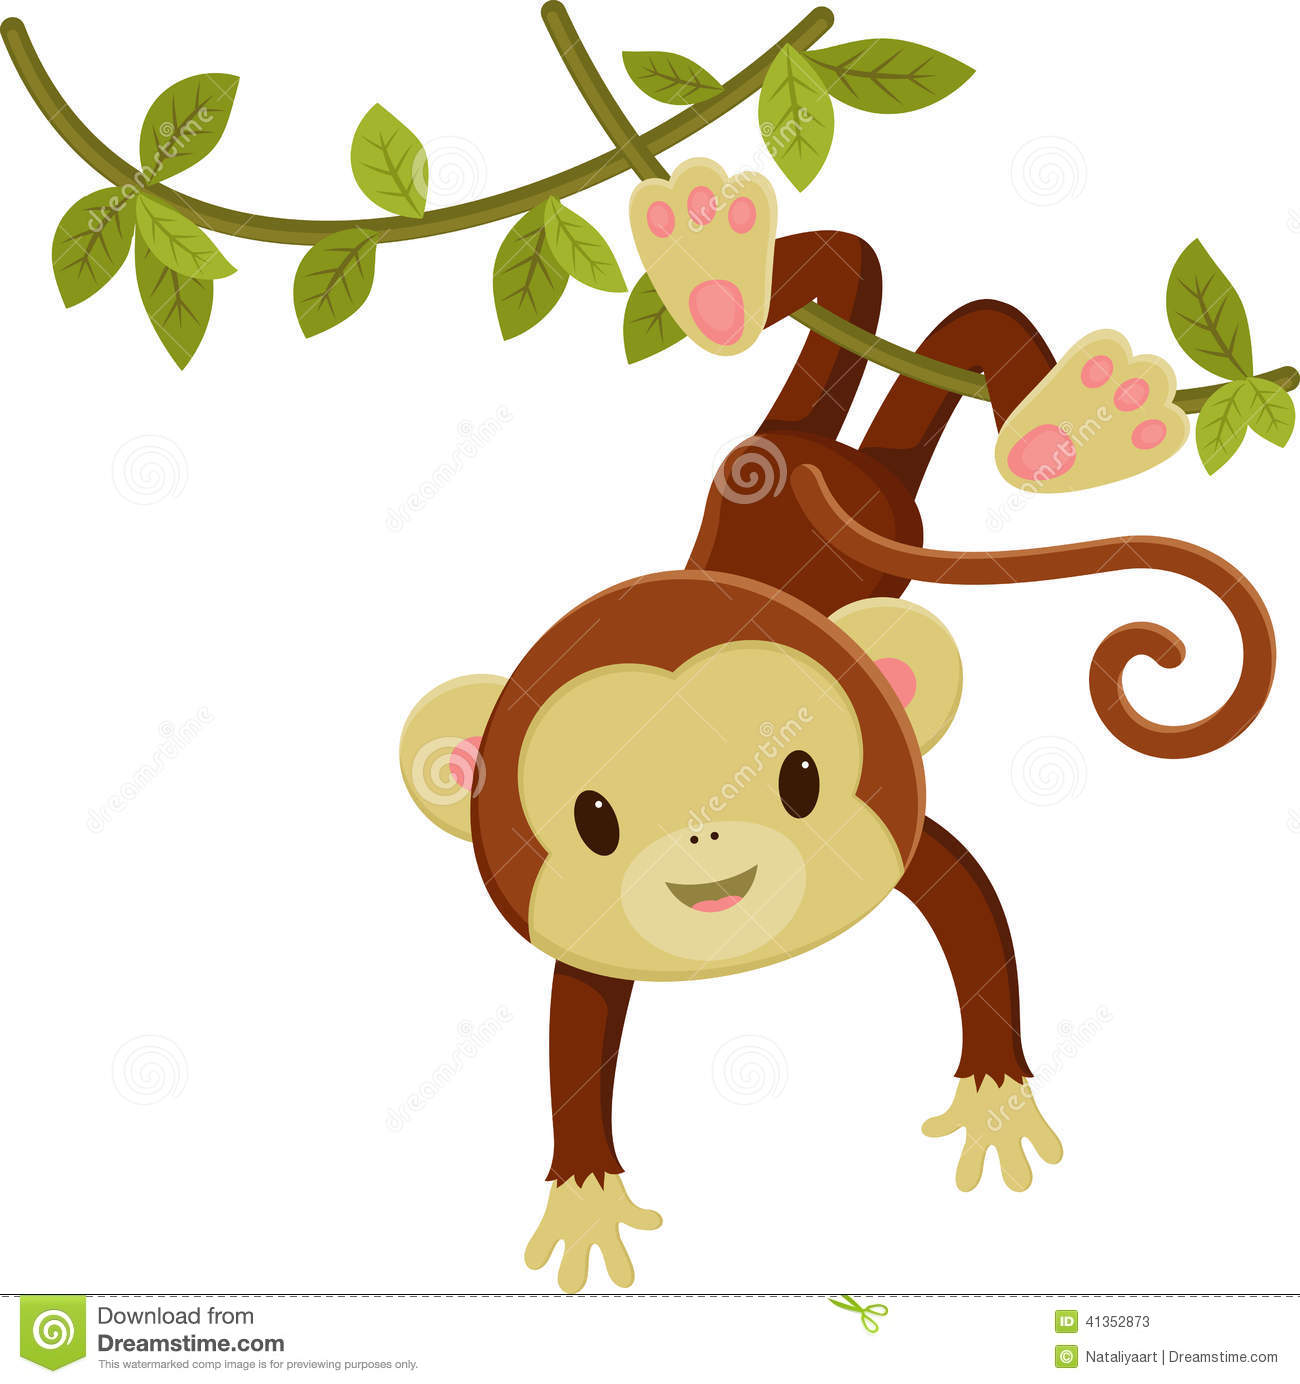 Baby Girl Monkey Clip Art Set ... 9ff123-Baby Girl Monkey Clip Art Set ... 9ff123c1f2bab70e71fe36ca32154c .-10